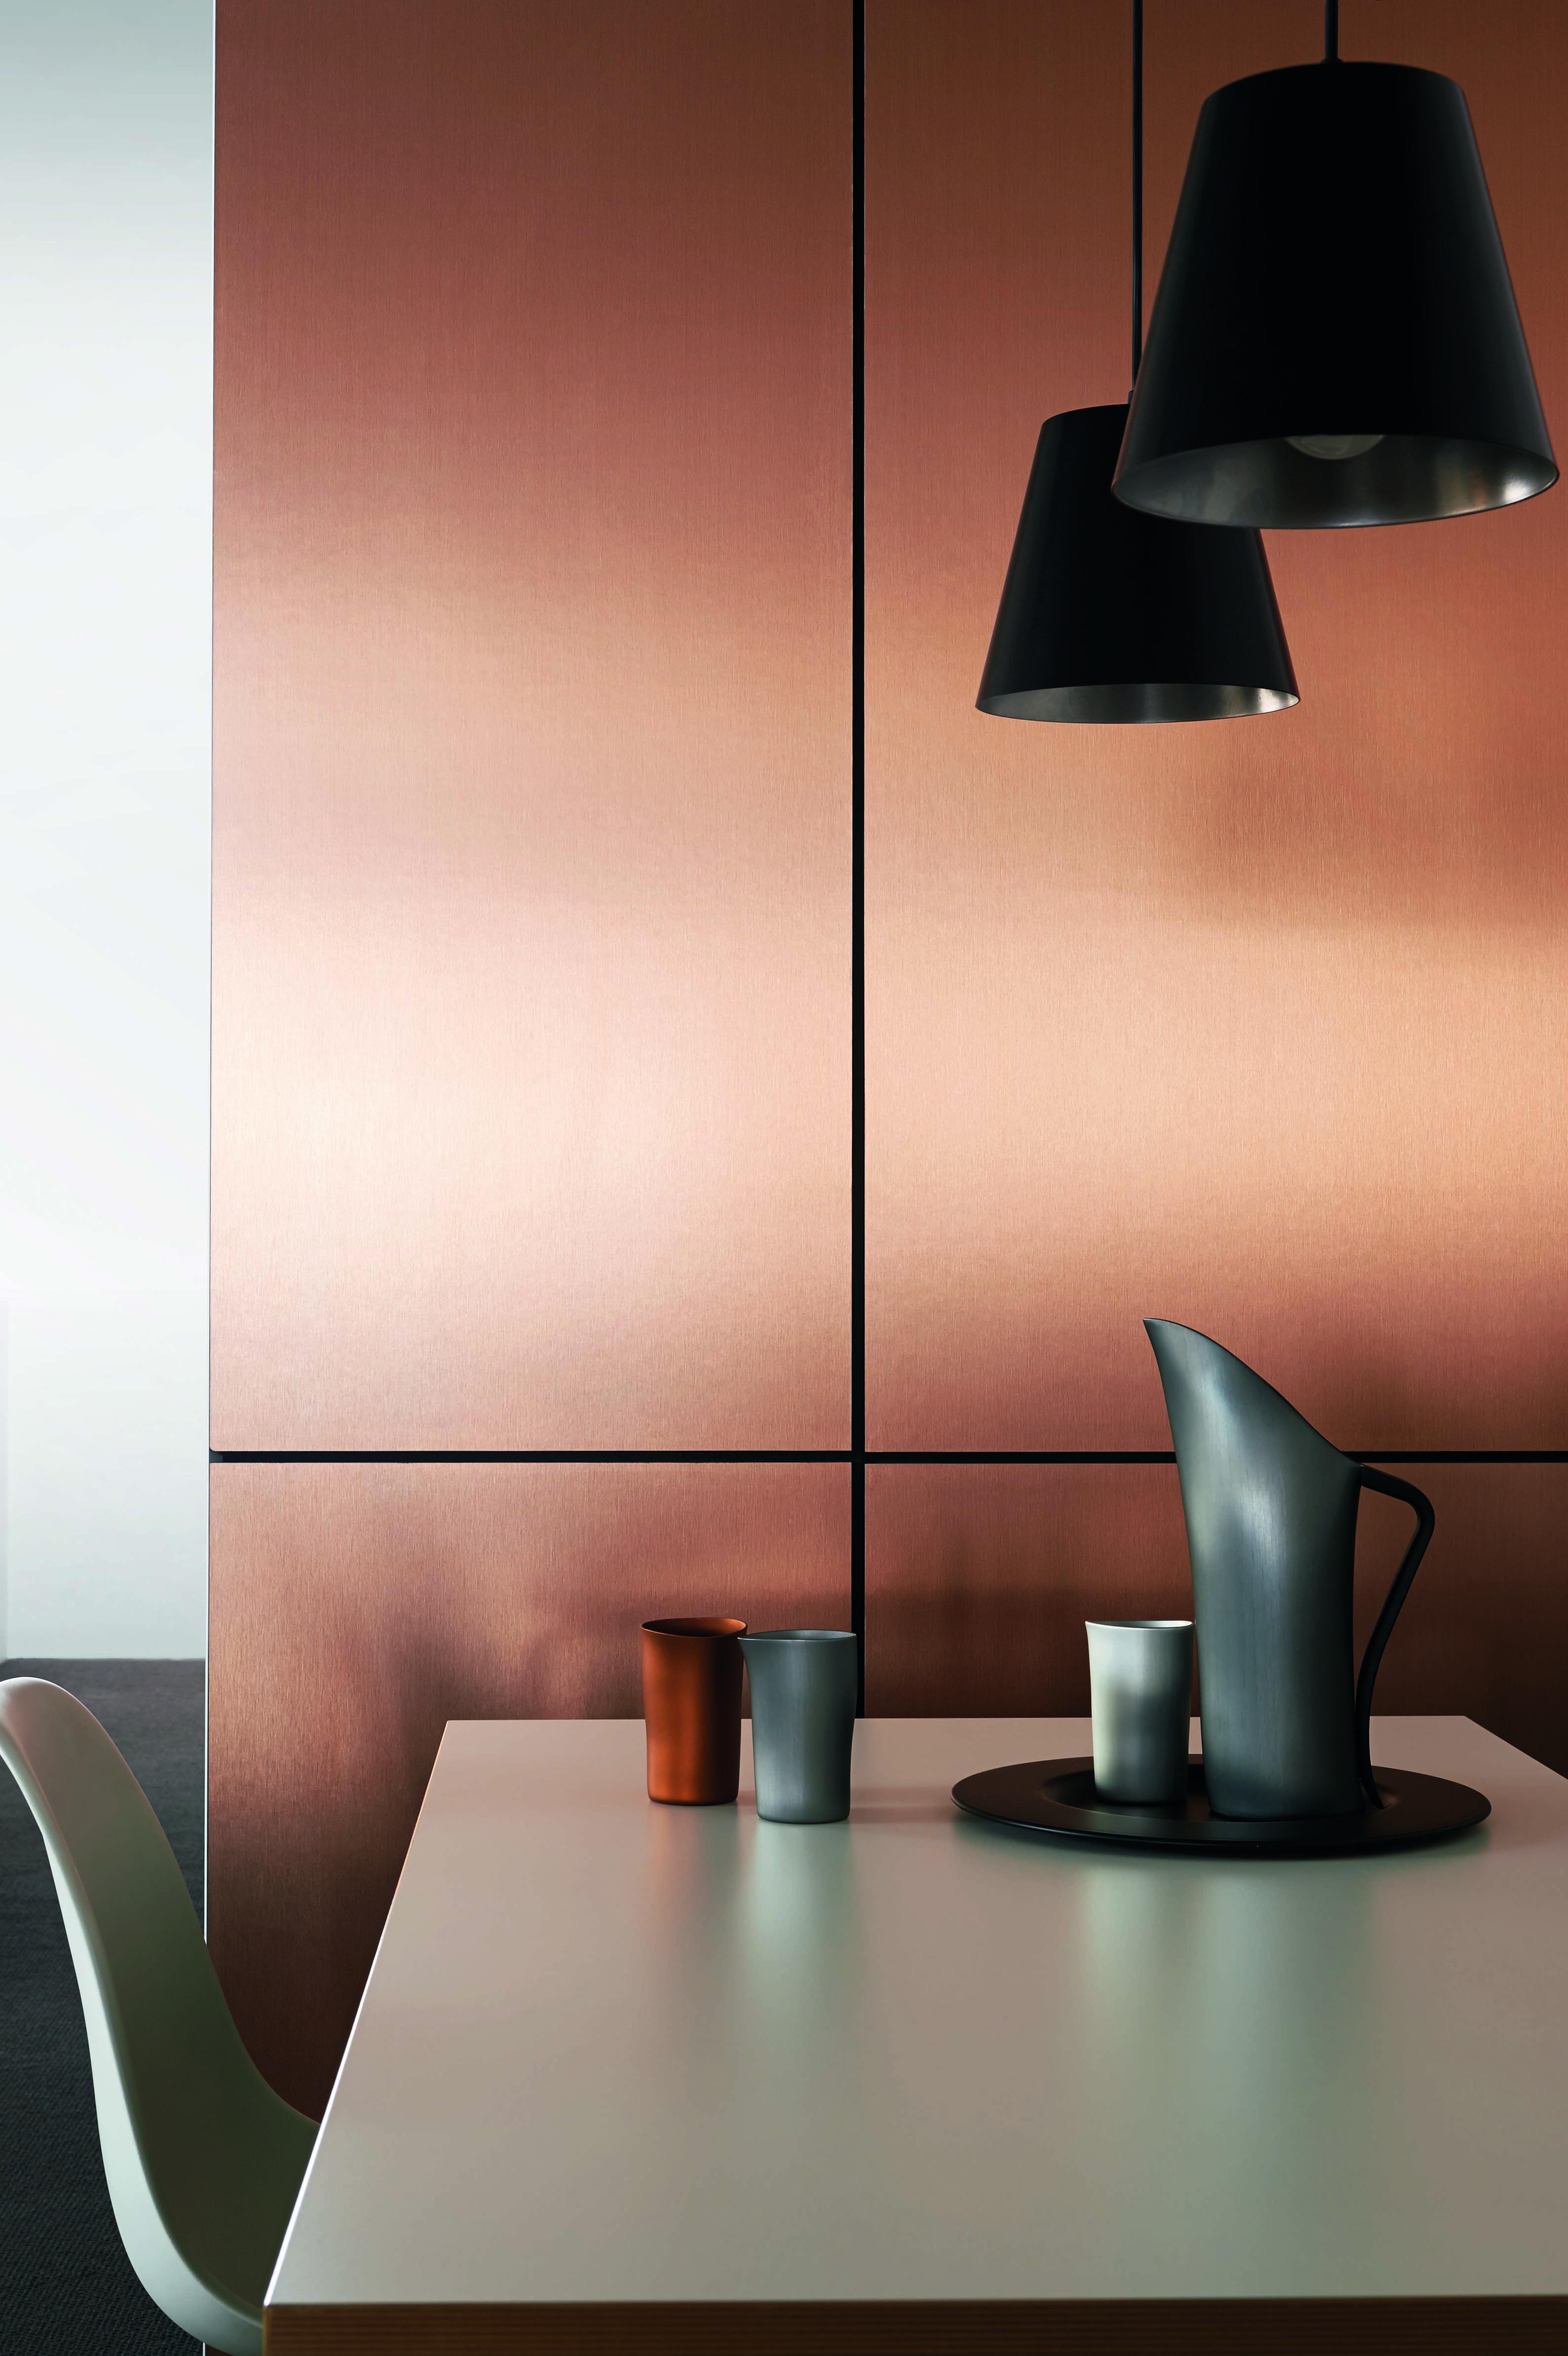 Laminex, Plex in Copper | Int/Ext | Pinterest | Apartments ...